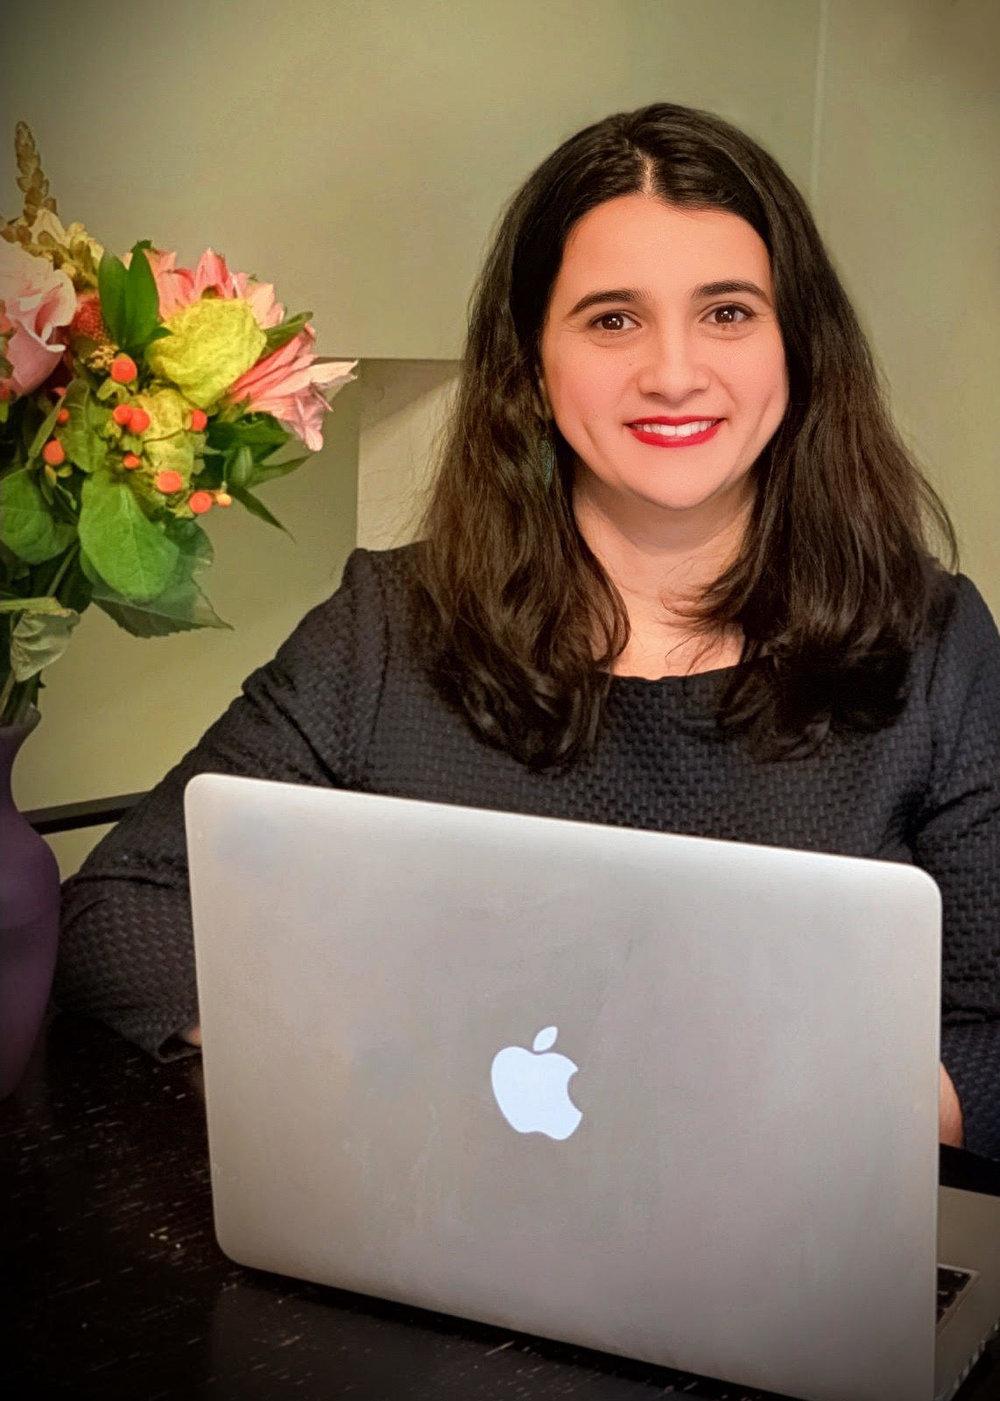 Author Natasha Tynes